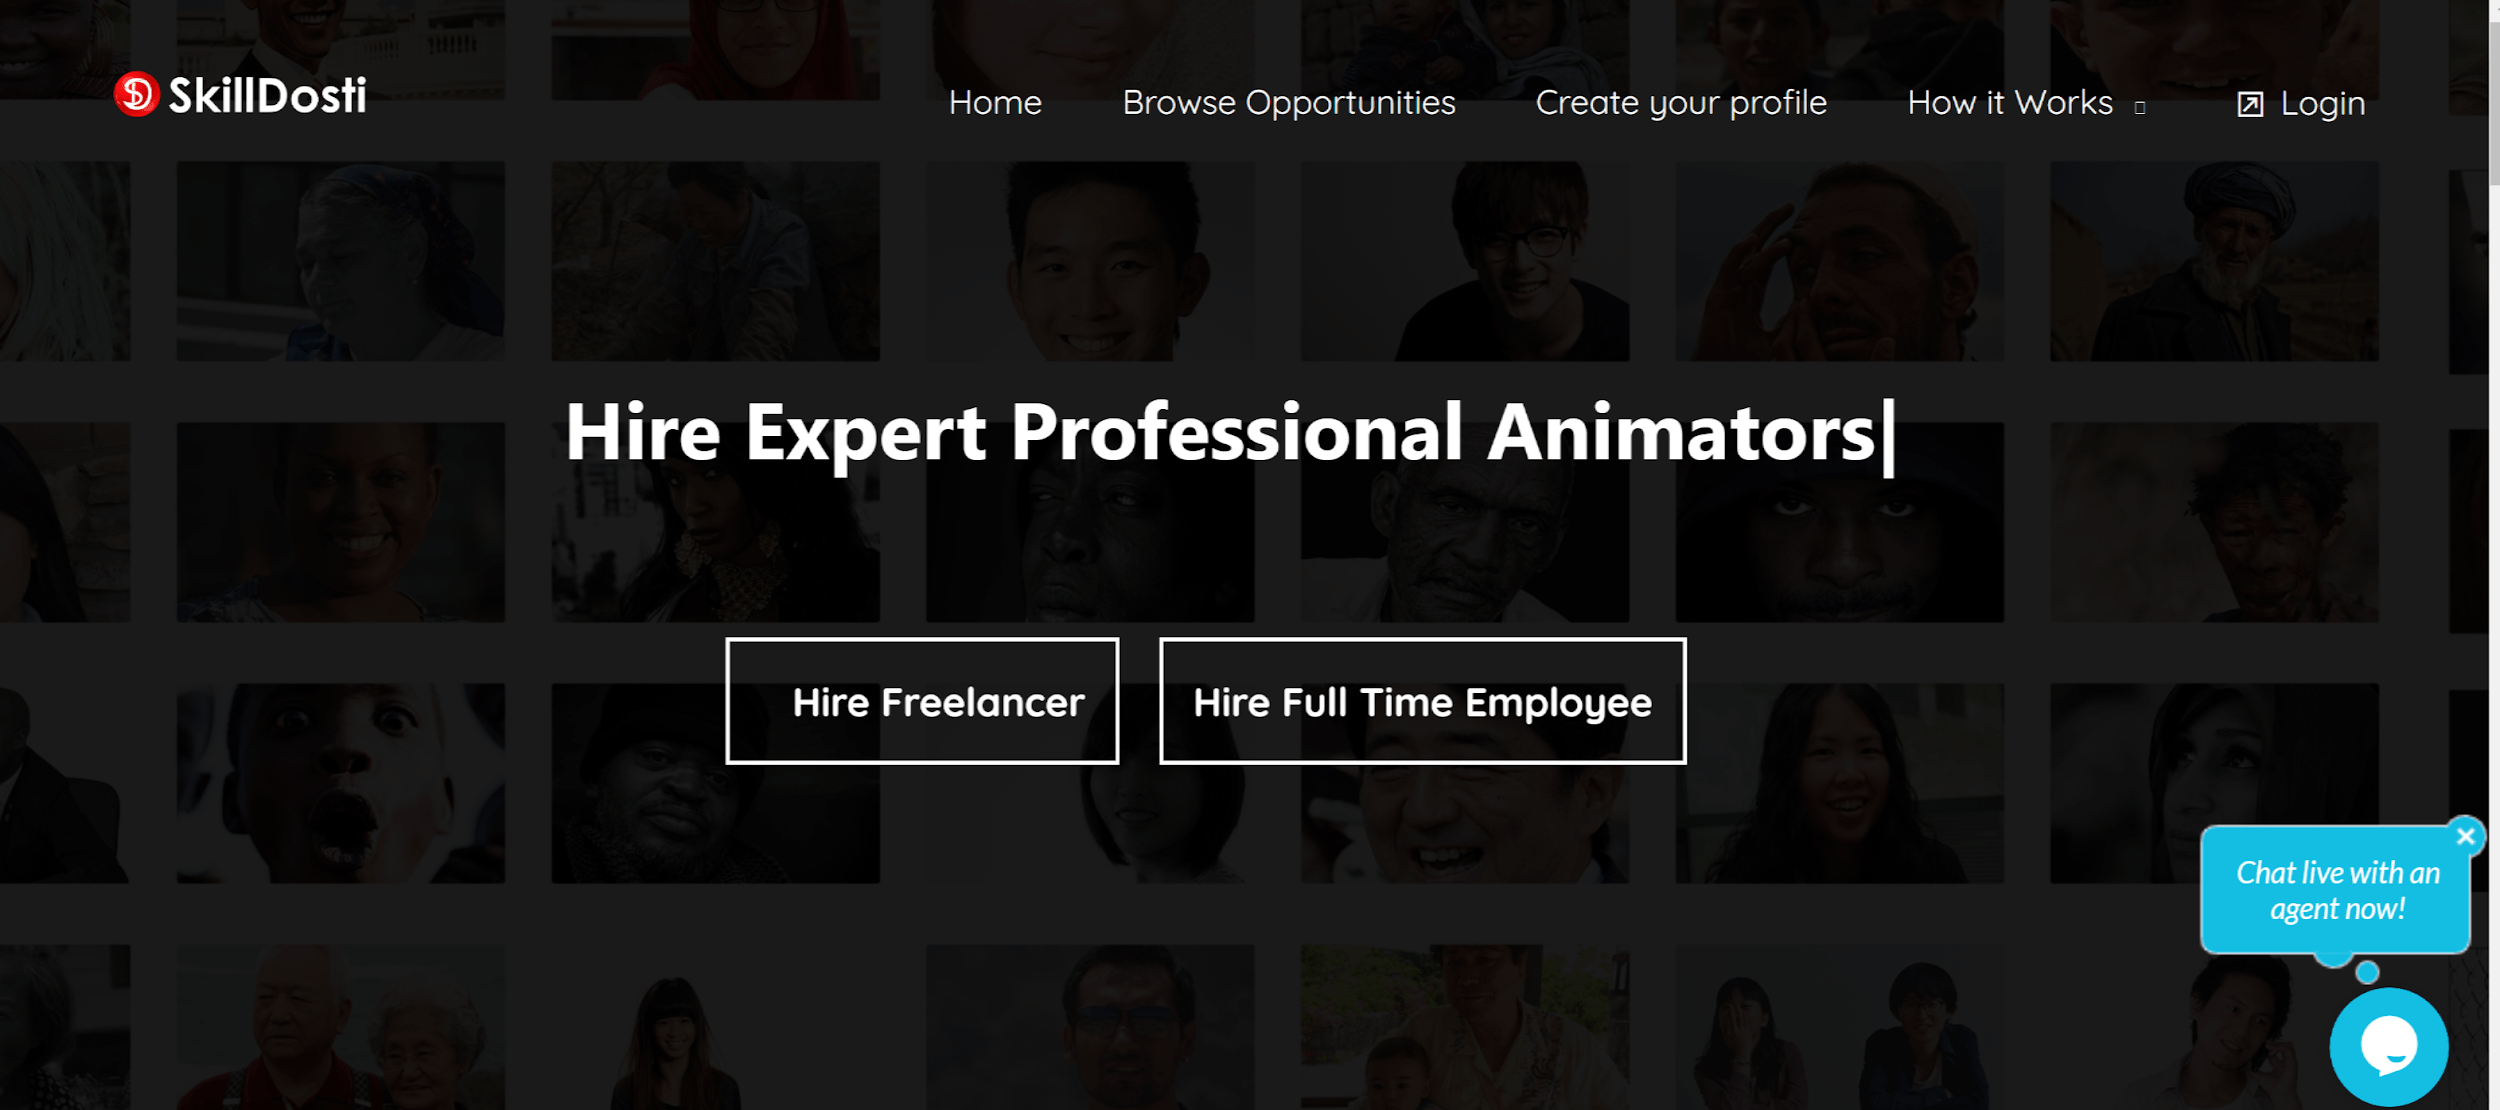 Skilldosti screenshot - homepage